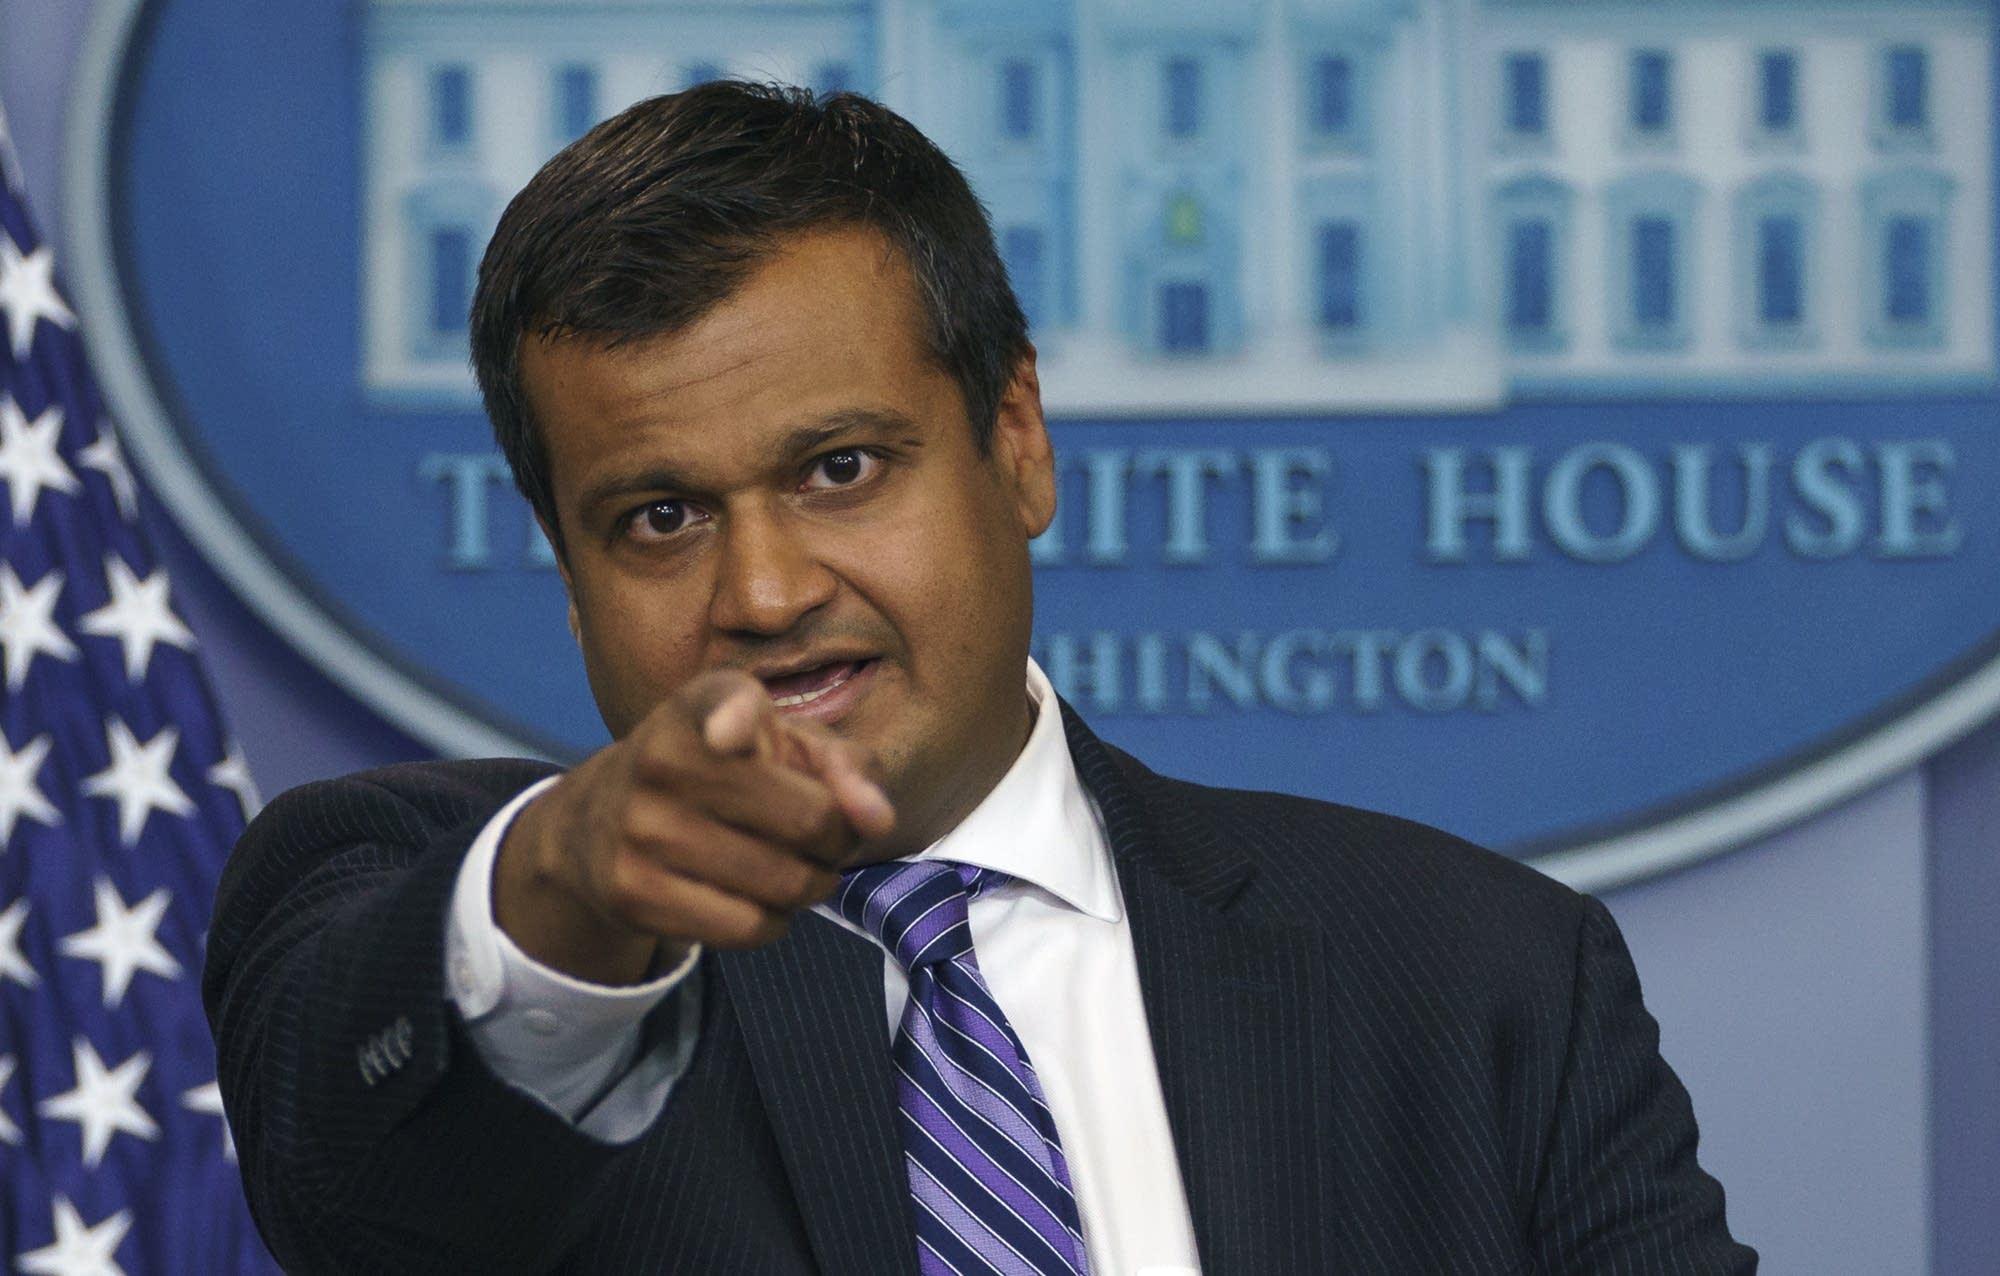 White House principal deputy press secretary Raj Shah